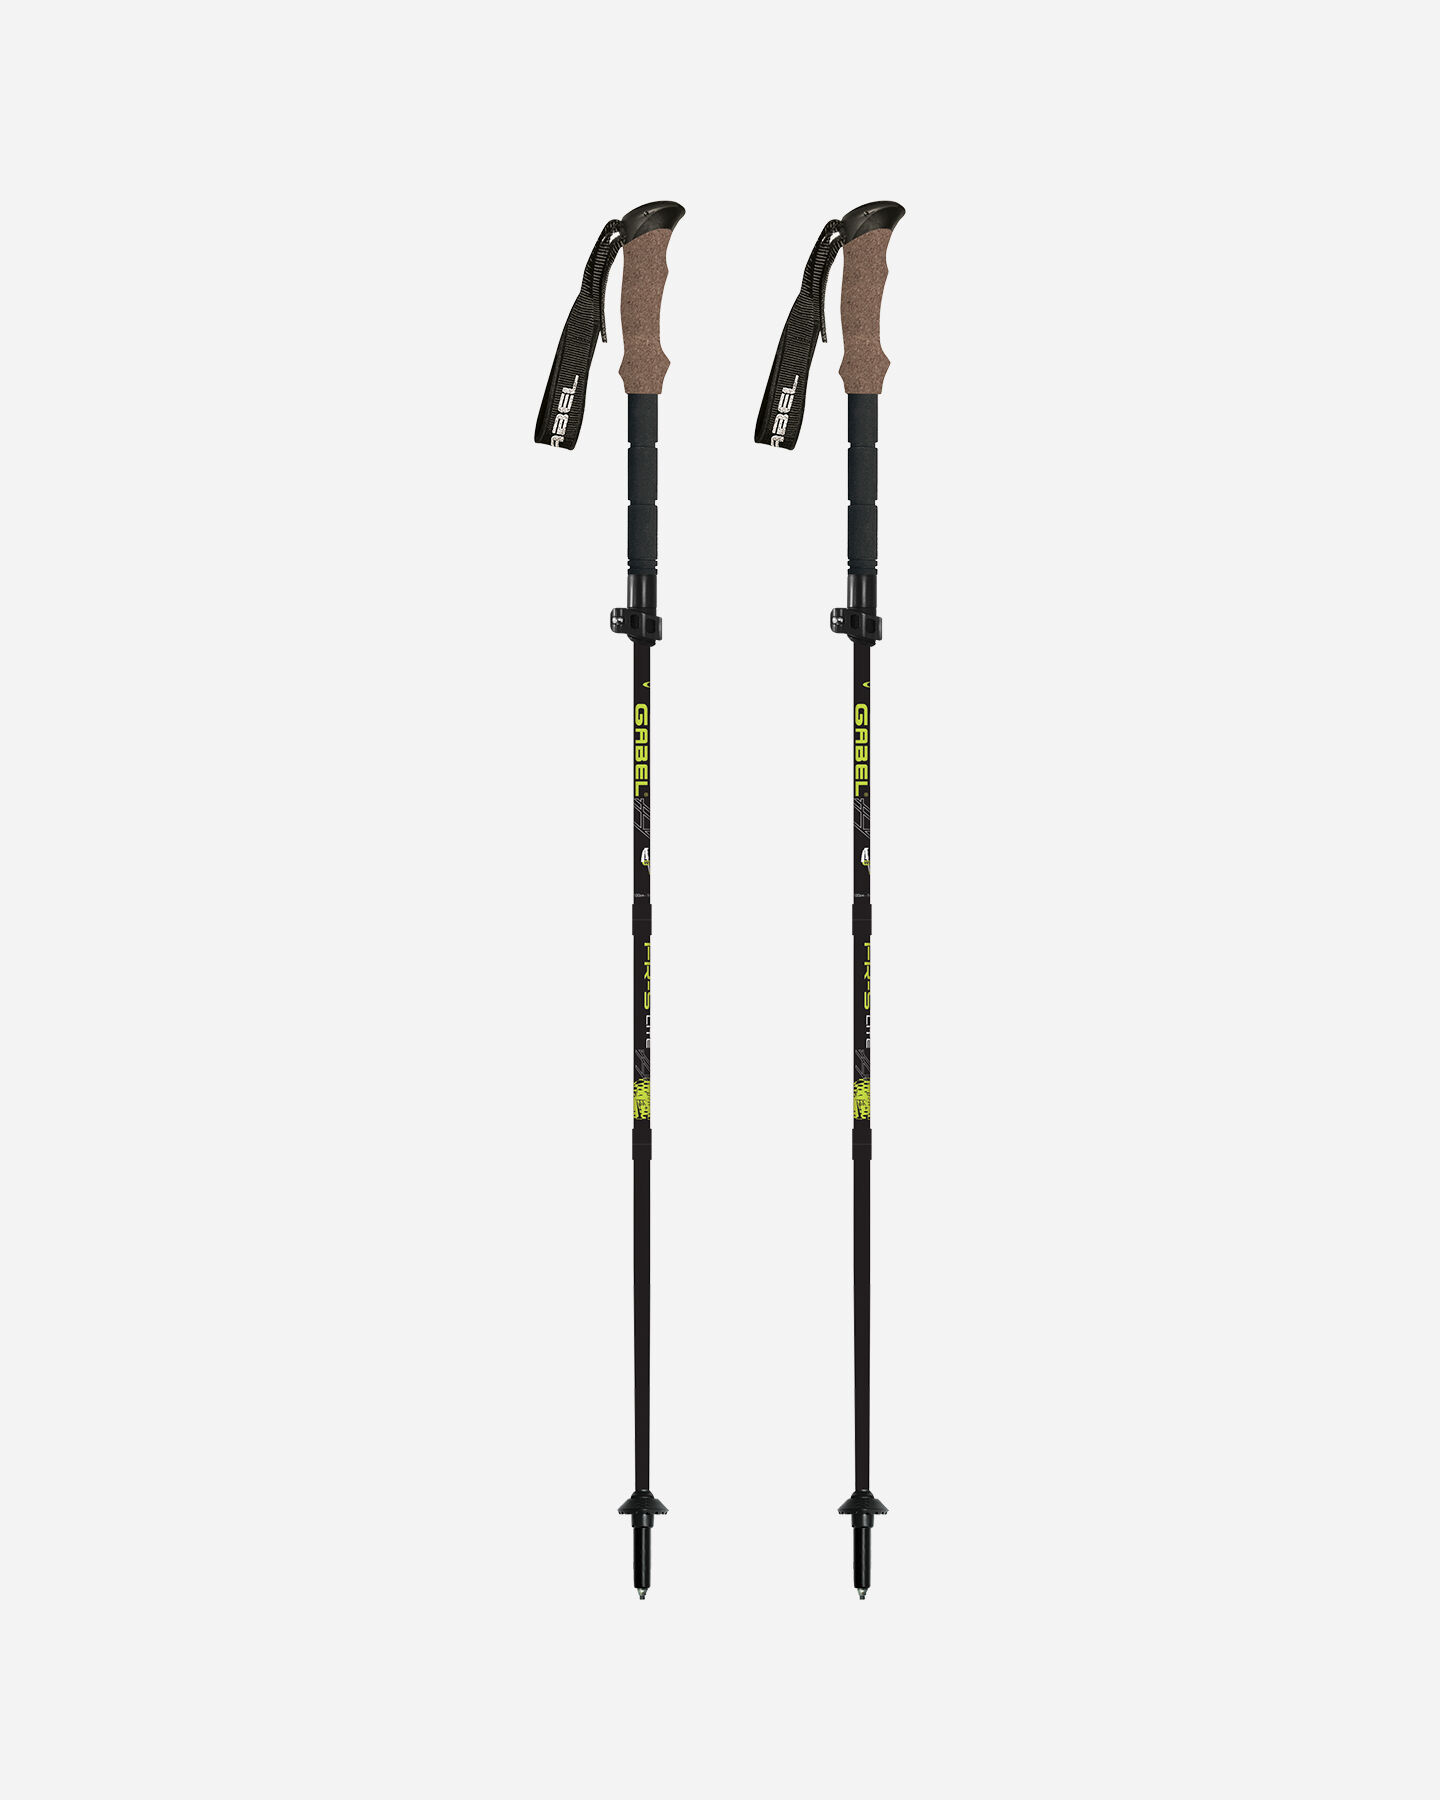 Bastoncini trekking GABEL FR-5 CORK TECH FOLDABLE S4091941|1|UNI scatto 0